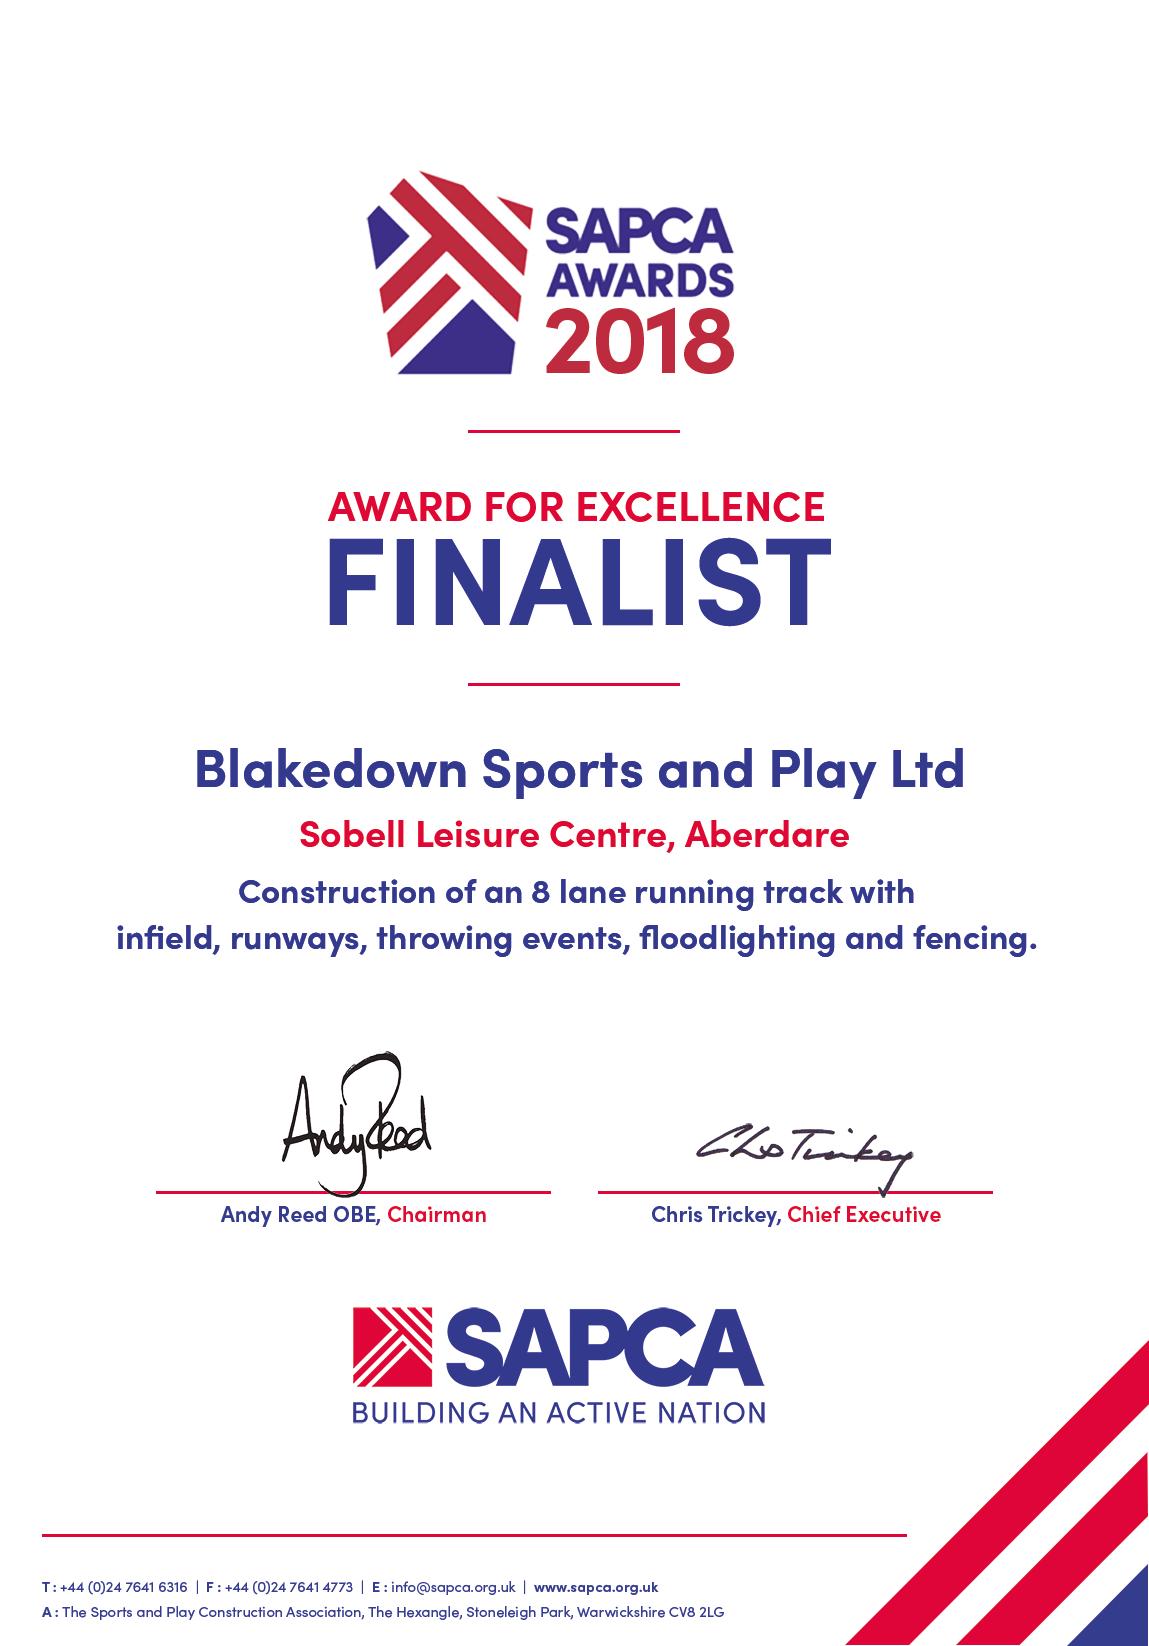 SAPCA_Awards_Certificate_Finalists_2018.png